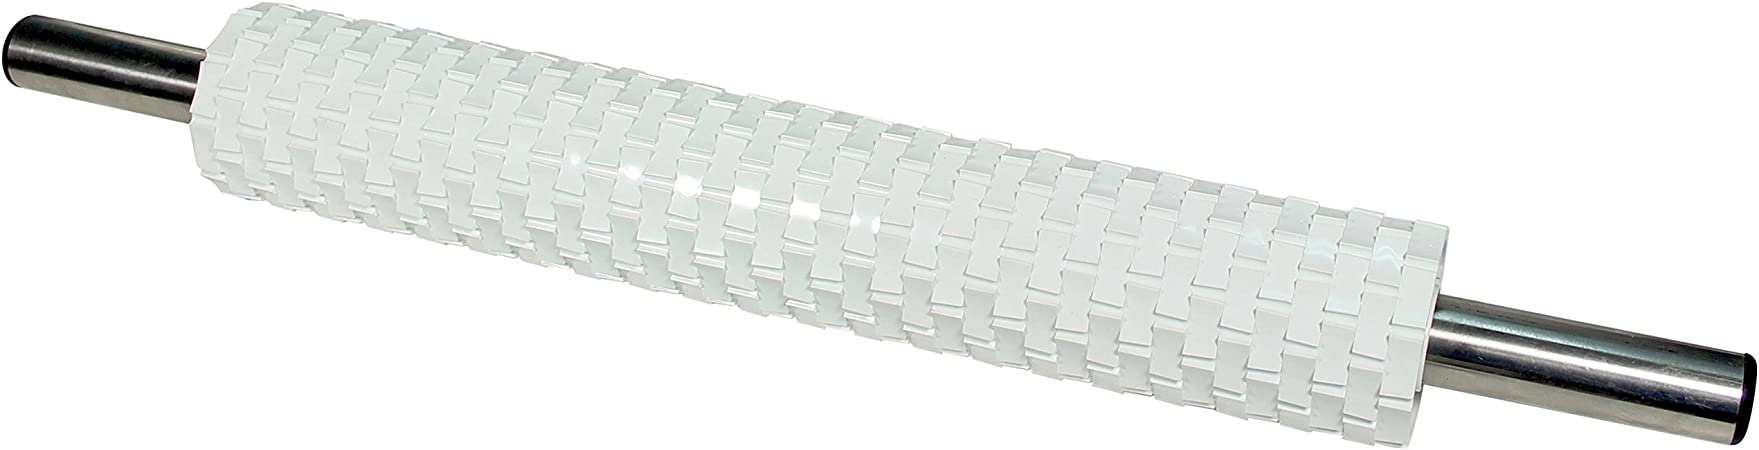 6-Pulgadas PME Rodillo de Acero Inoxidable 15 cm